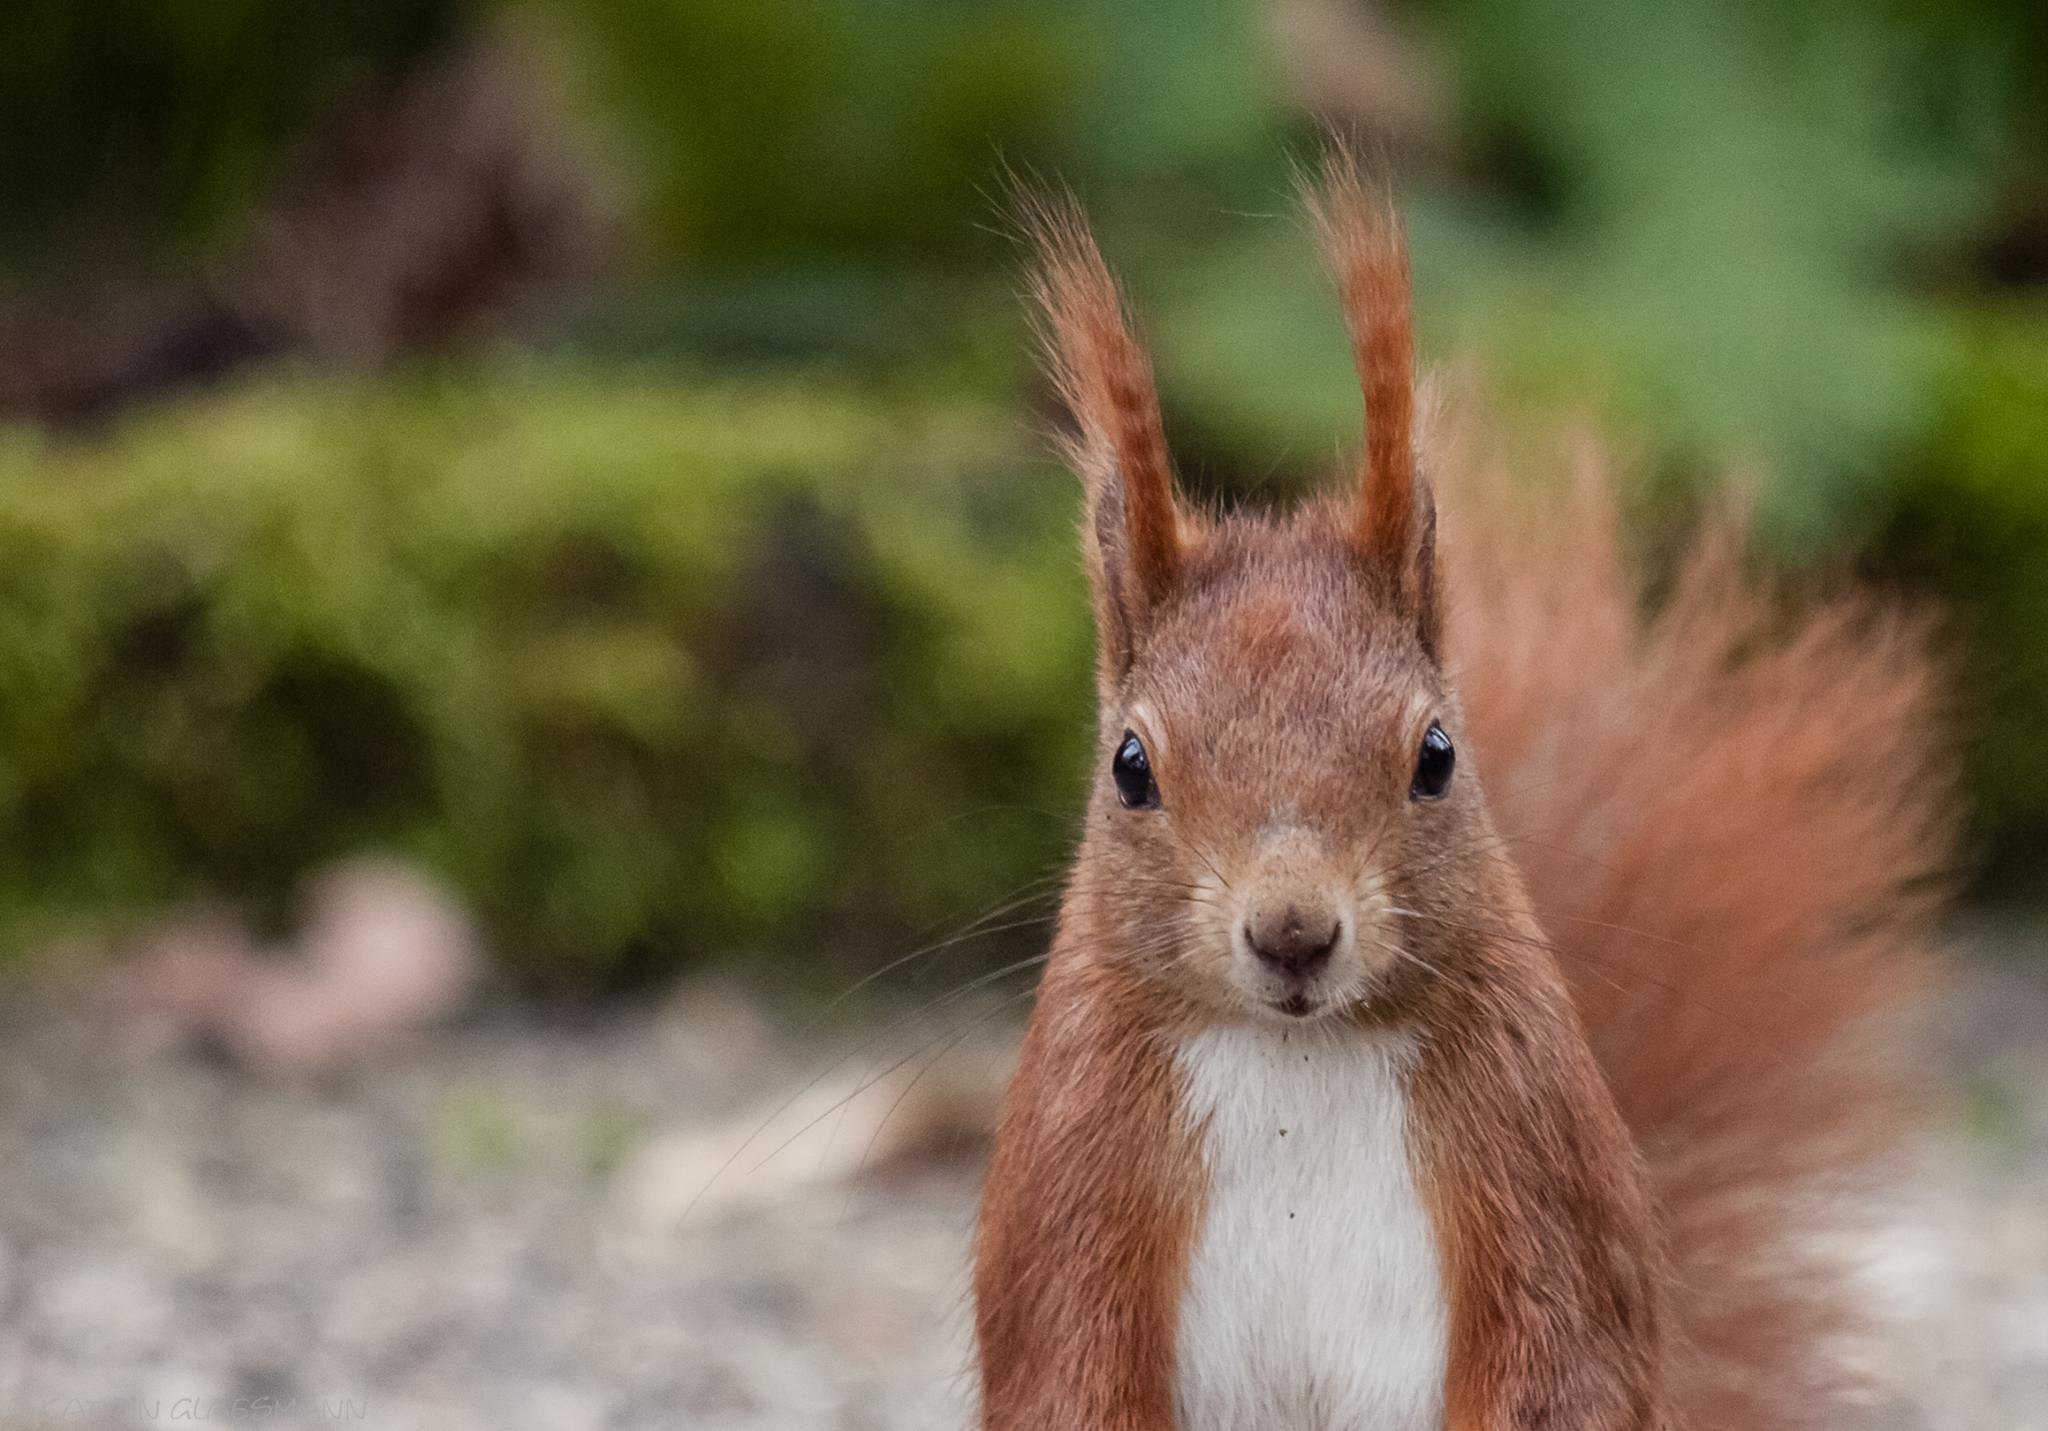 A squirrel saying hello